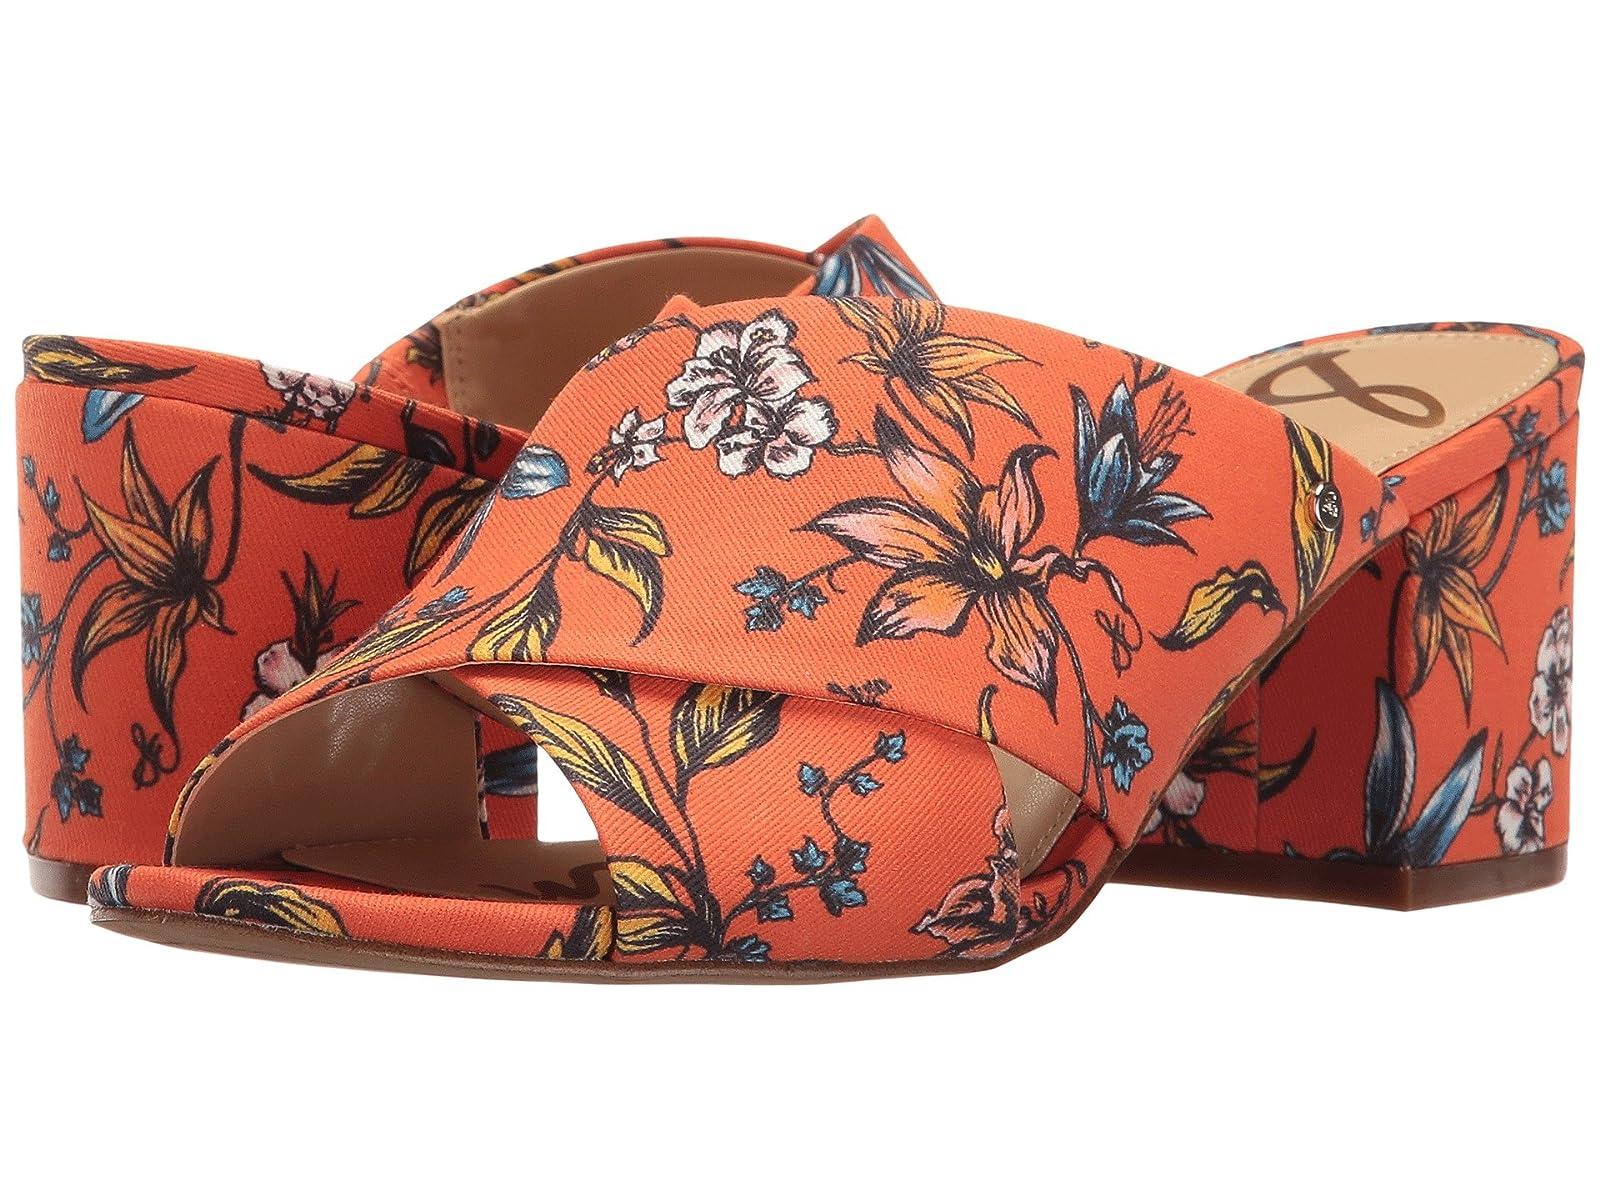 Sam Edelman StanleyCheap and distinctive eye-catching shoes